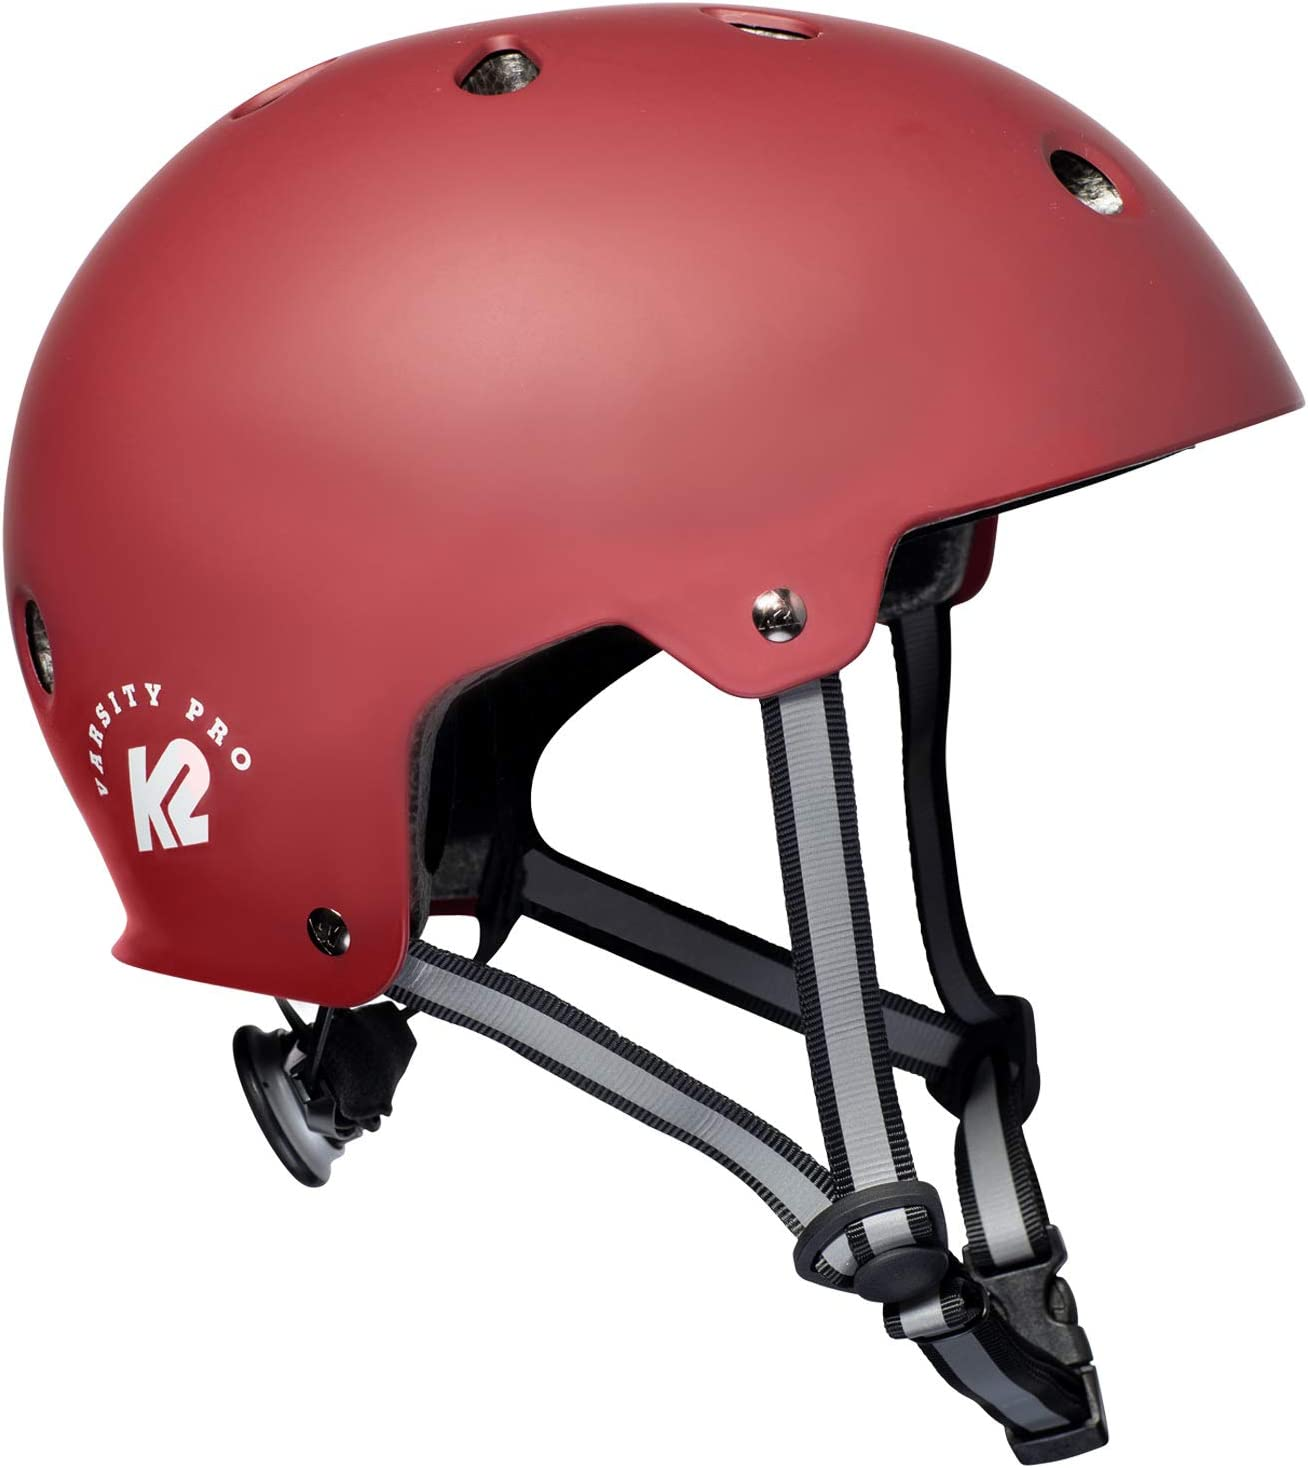 通信販売 K2 値引き Skate Varsity Pro Helmet